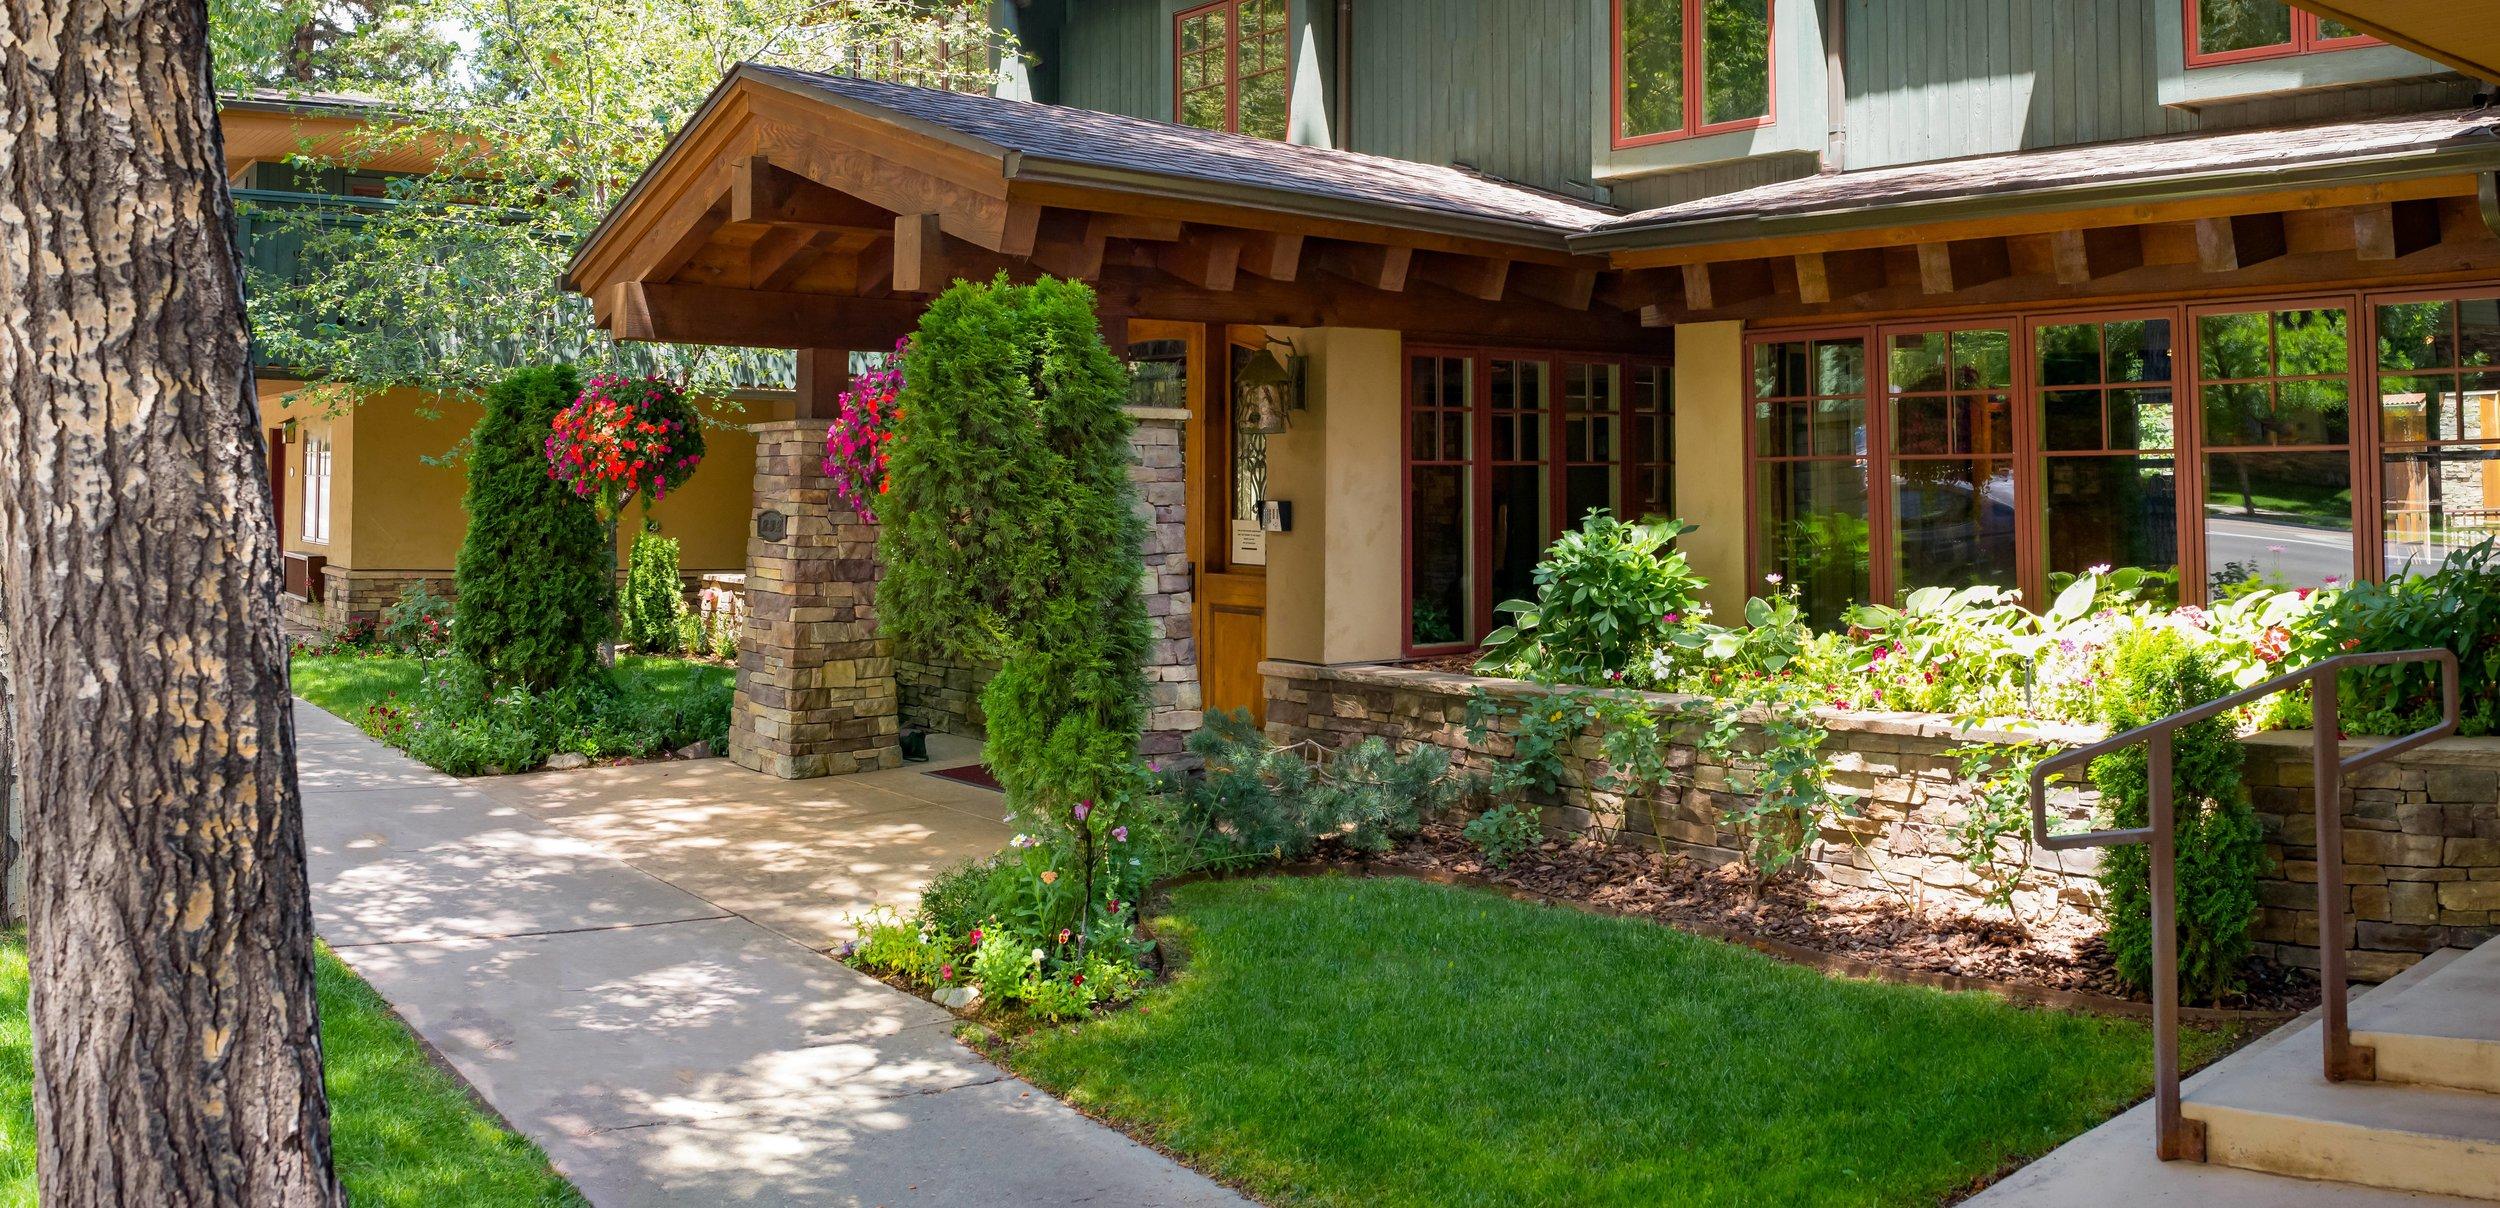 Aspen Hotel Landscape Architecture